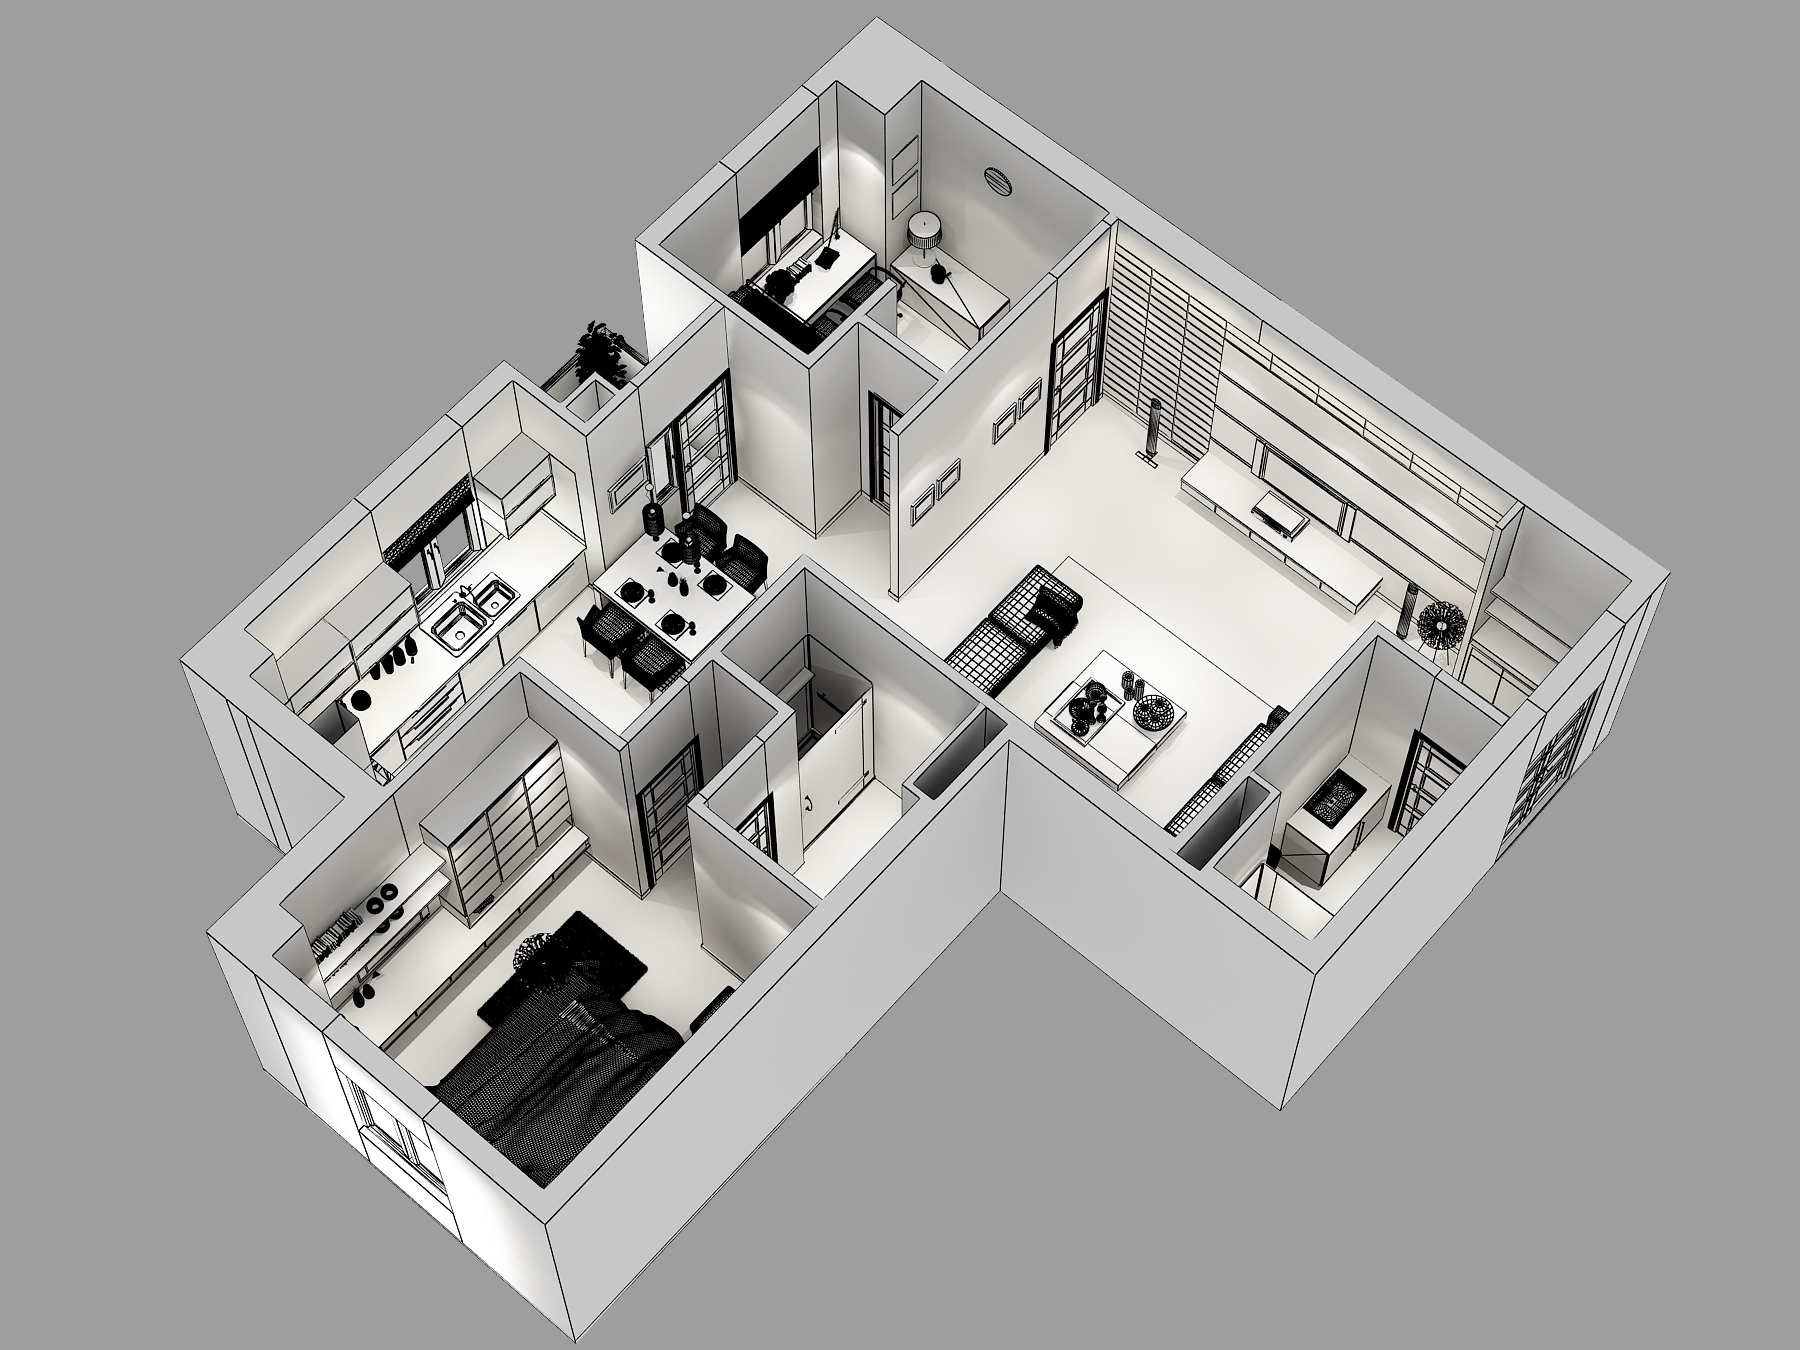 Cutaway Apartment Full Furnitures Modern Design: 3D Model Detailed House Cutaway 3D Model